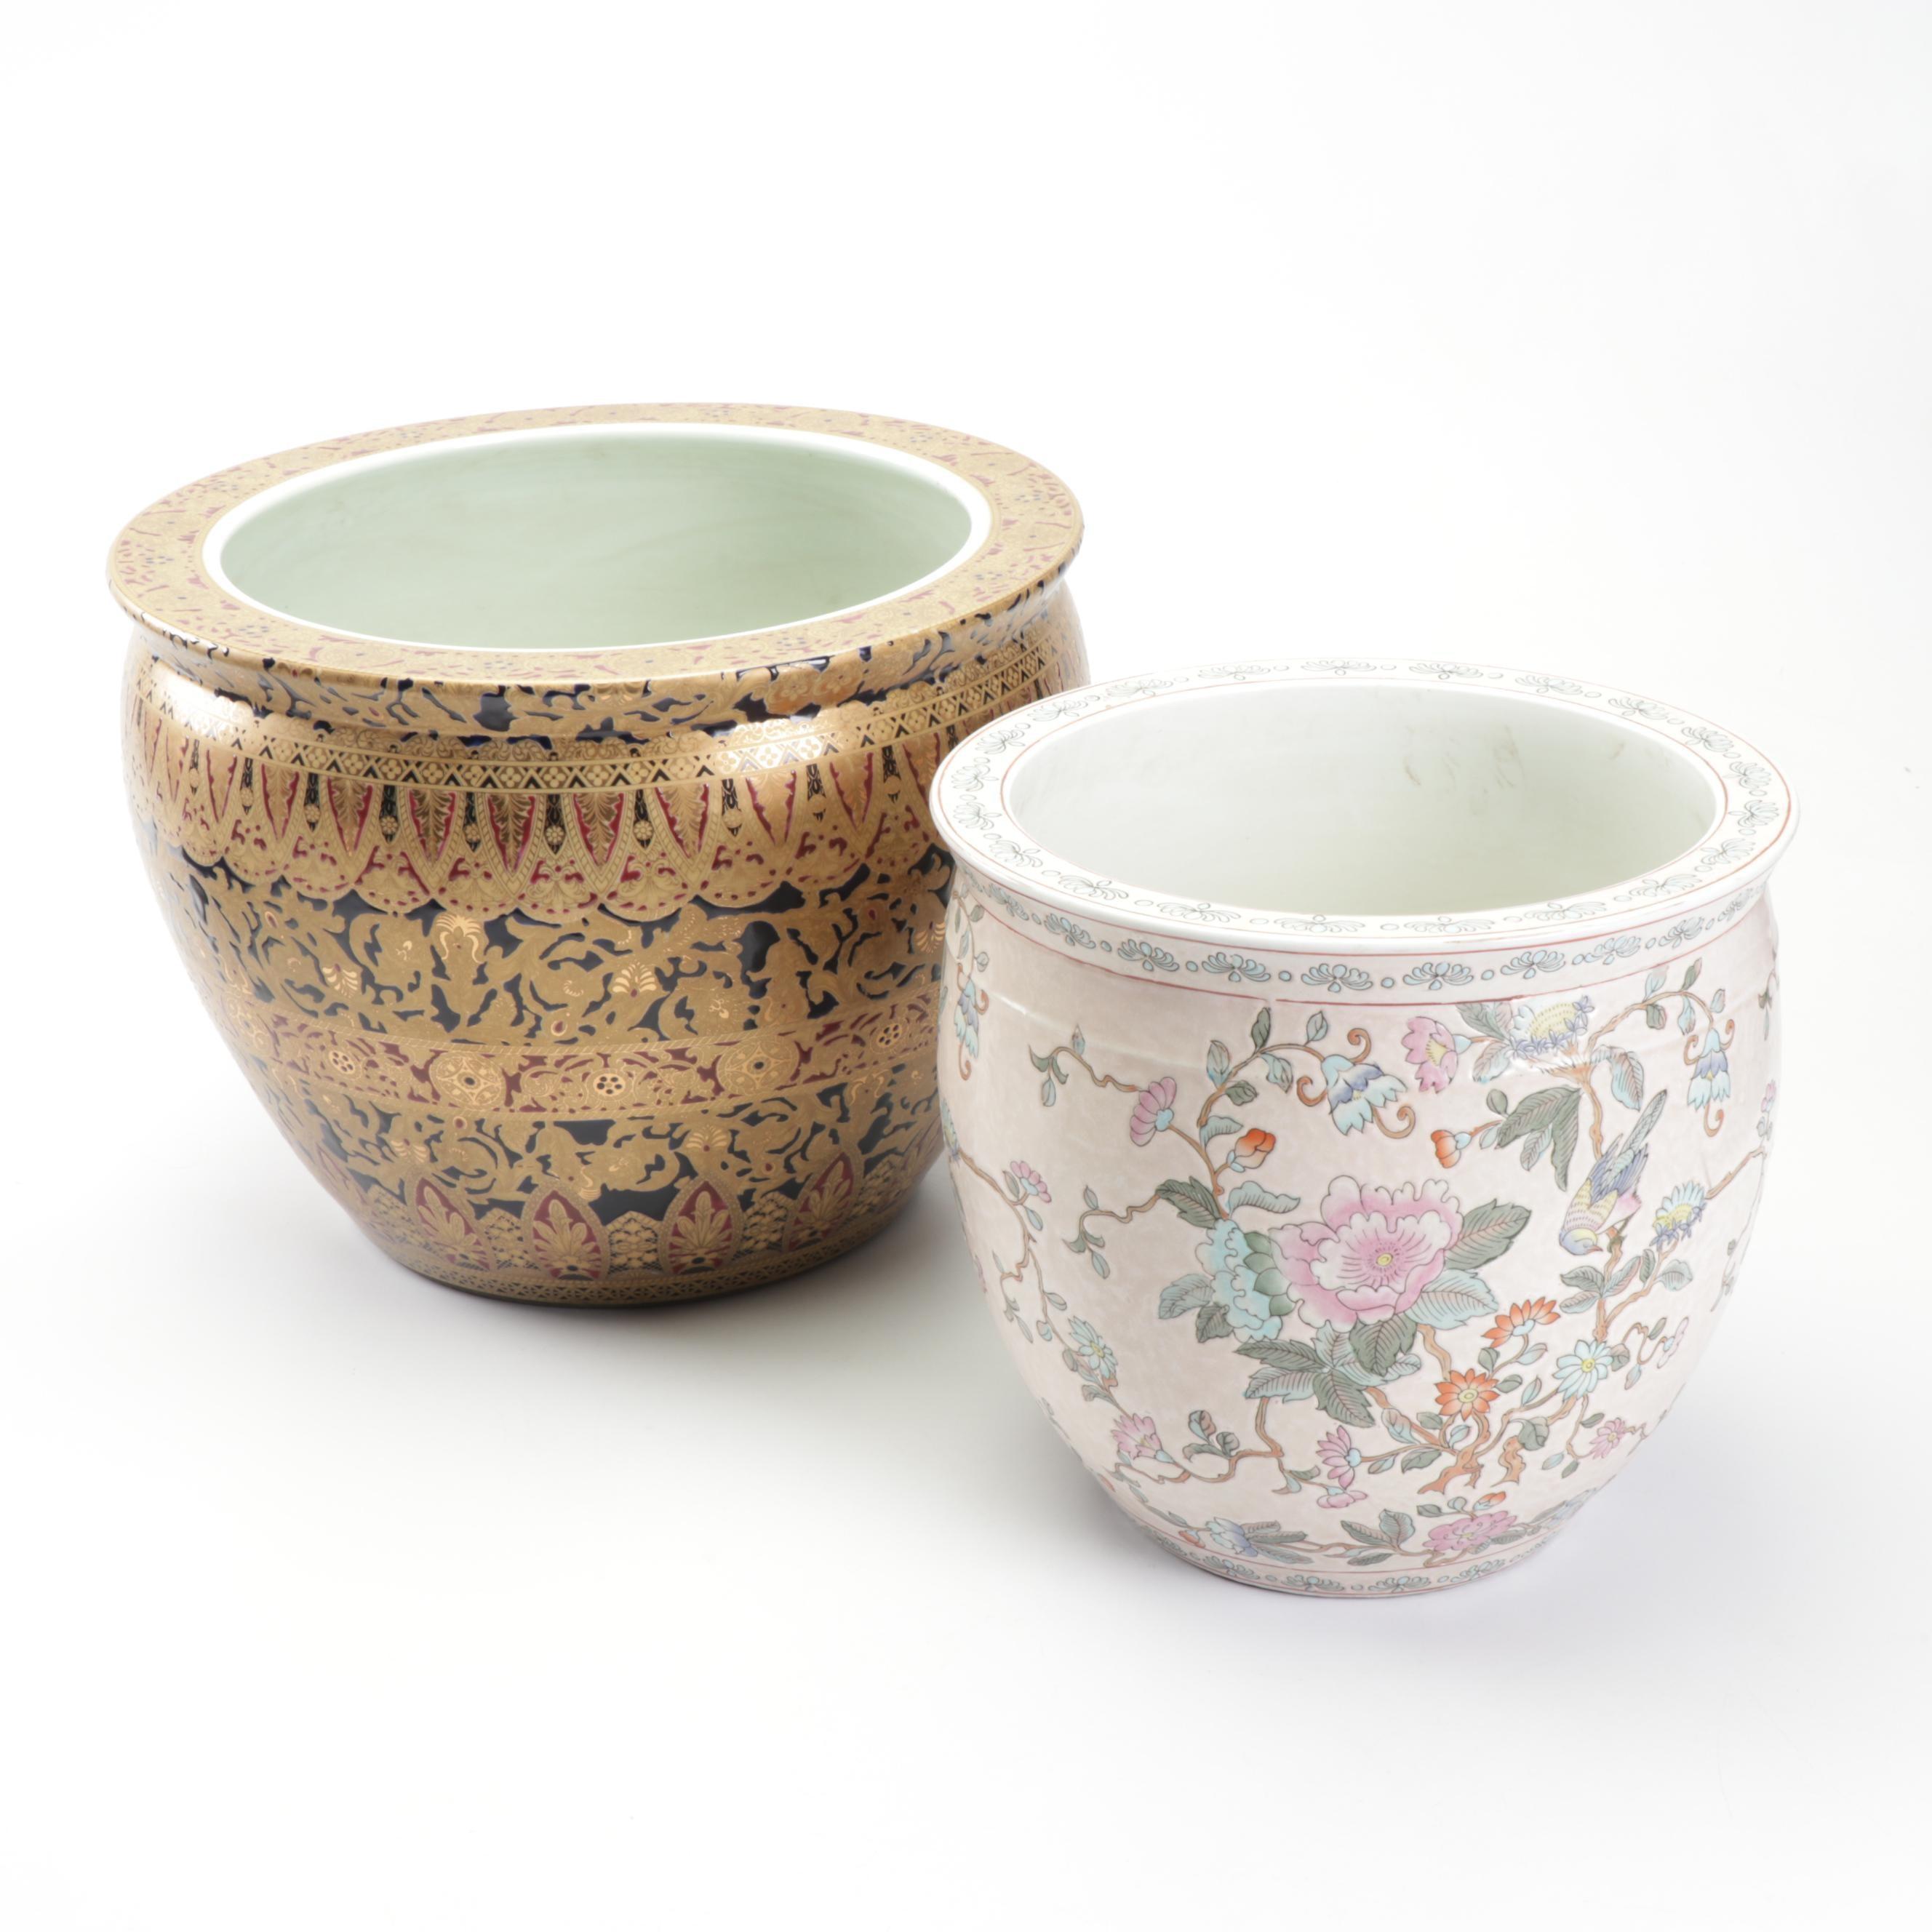 East Asian Porcelain and Enamel Planters